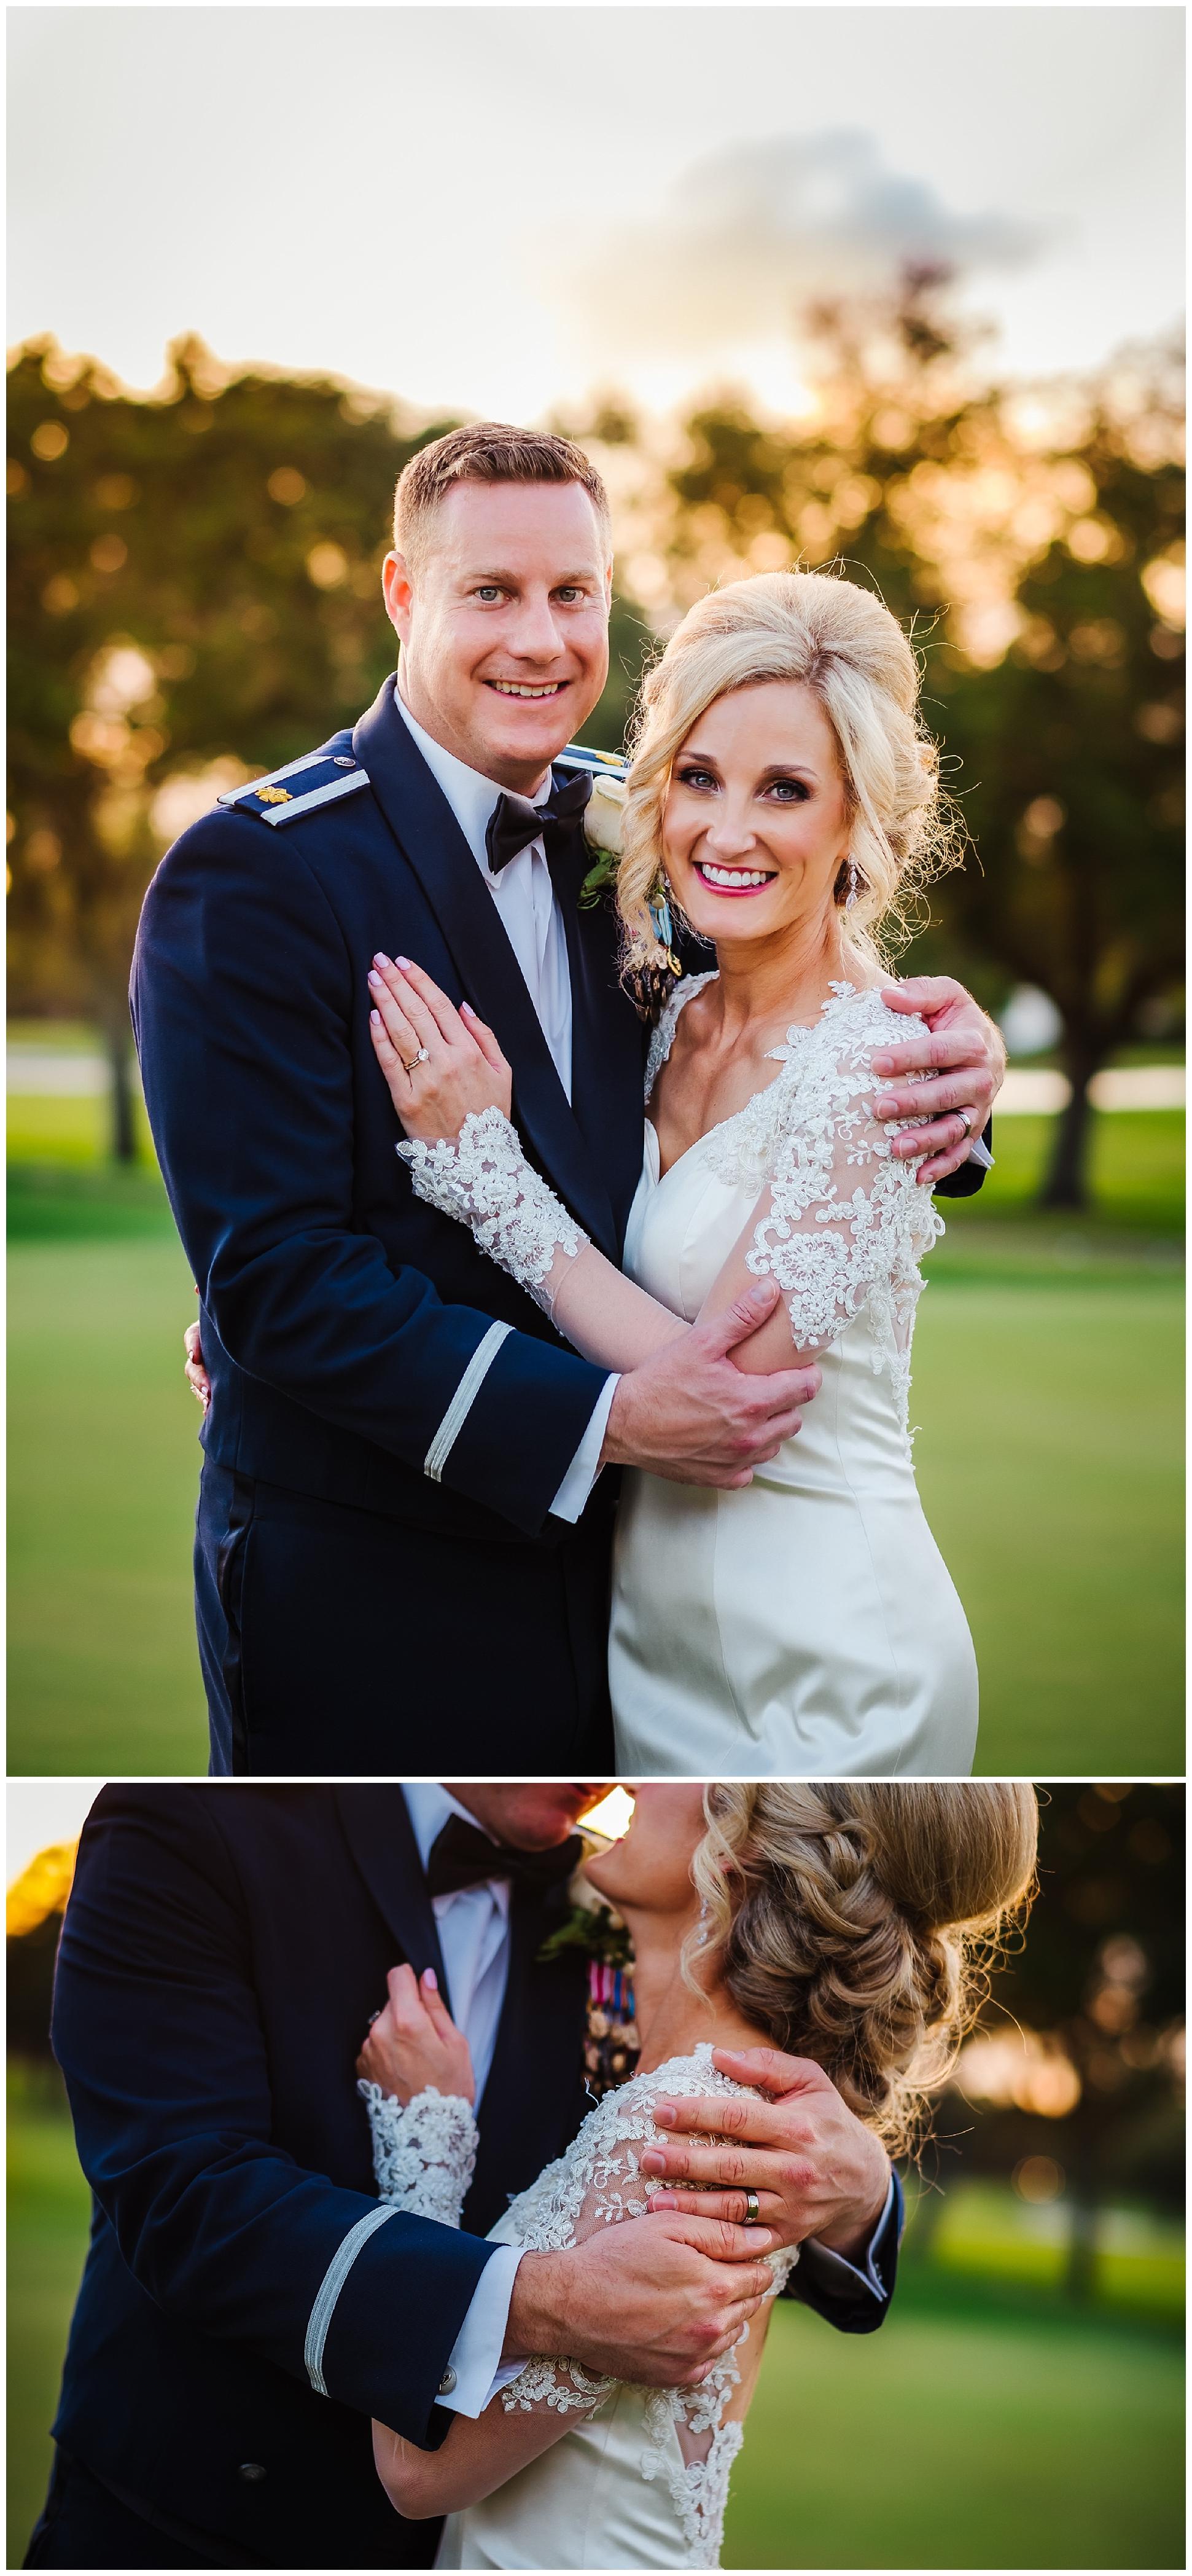 tampa-wedding-photographer-sleeves-palma-ceia-country-club-golf-course-sunset-luxury_0095.jpg